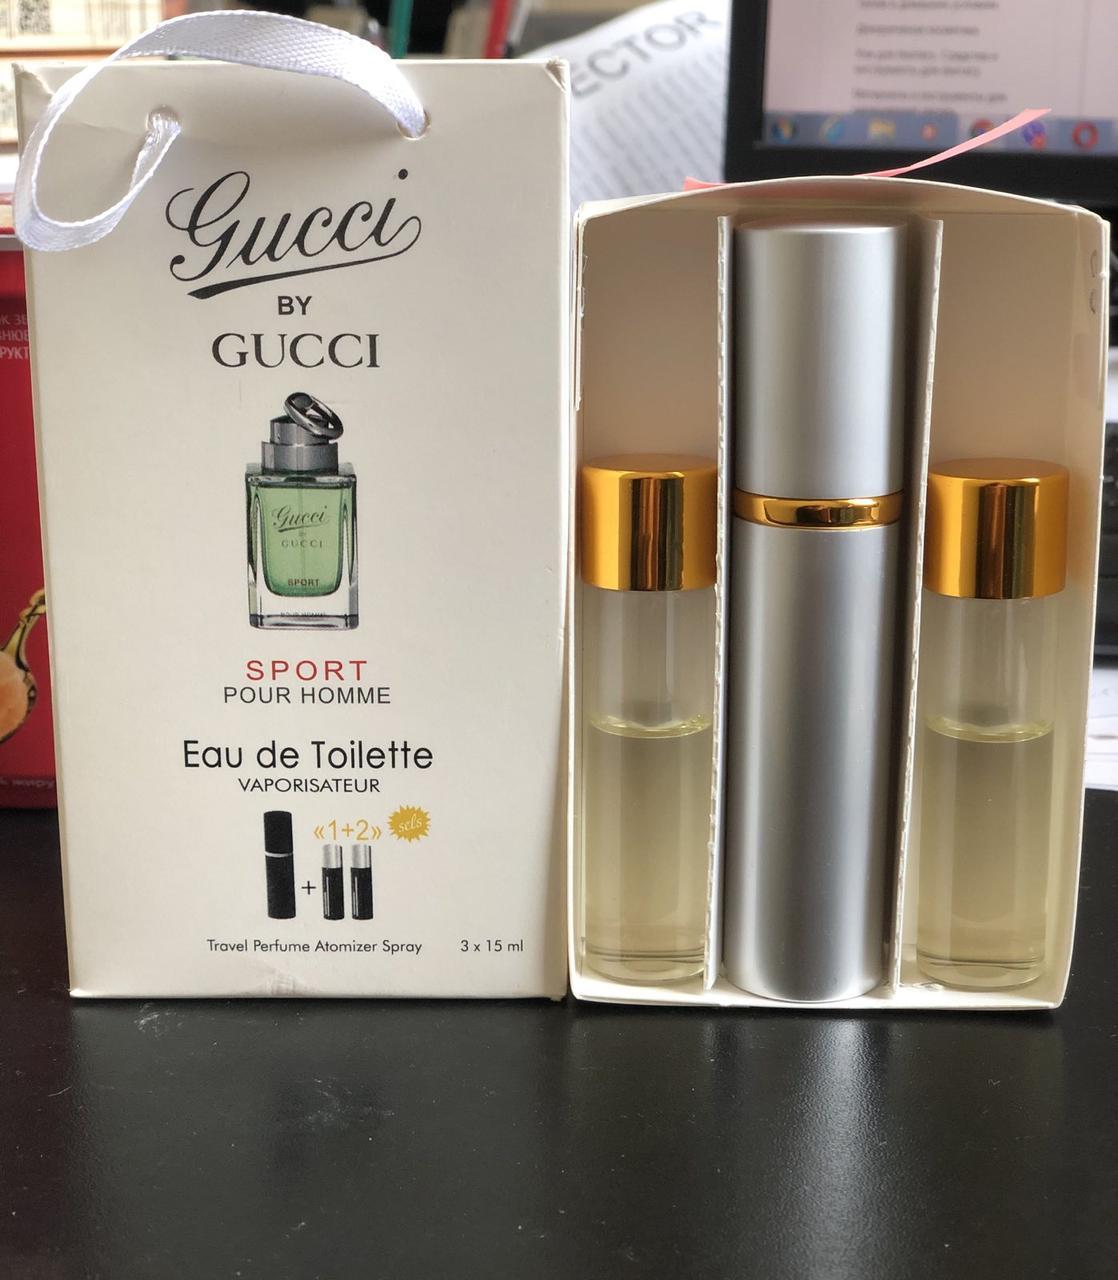 Gucci by Gucci Sport (Гучи бай гучи спорт) 3х15 мл-10m - репліка. Шлюб